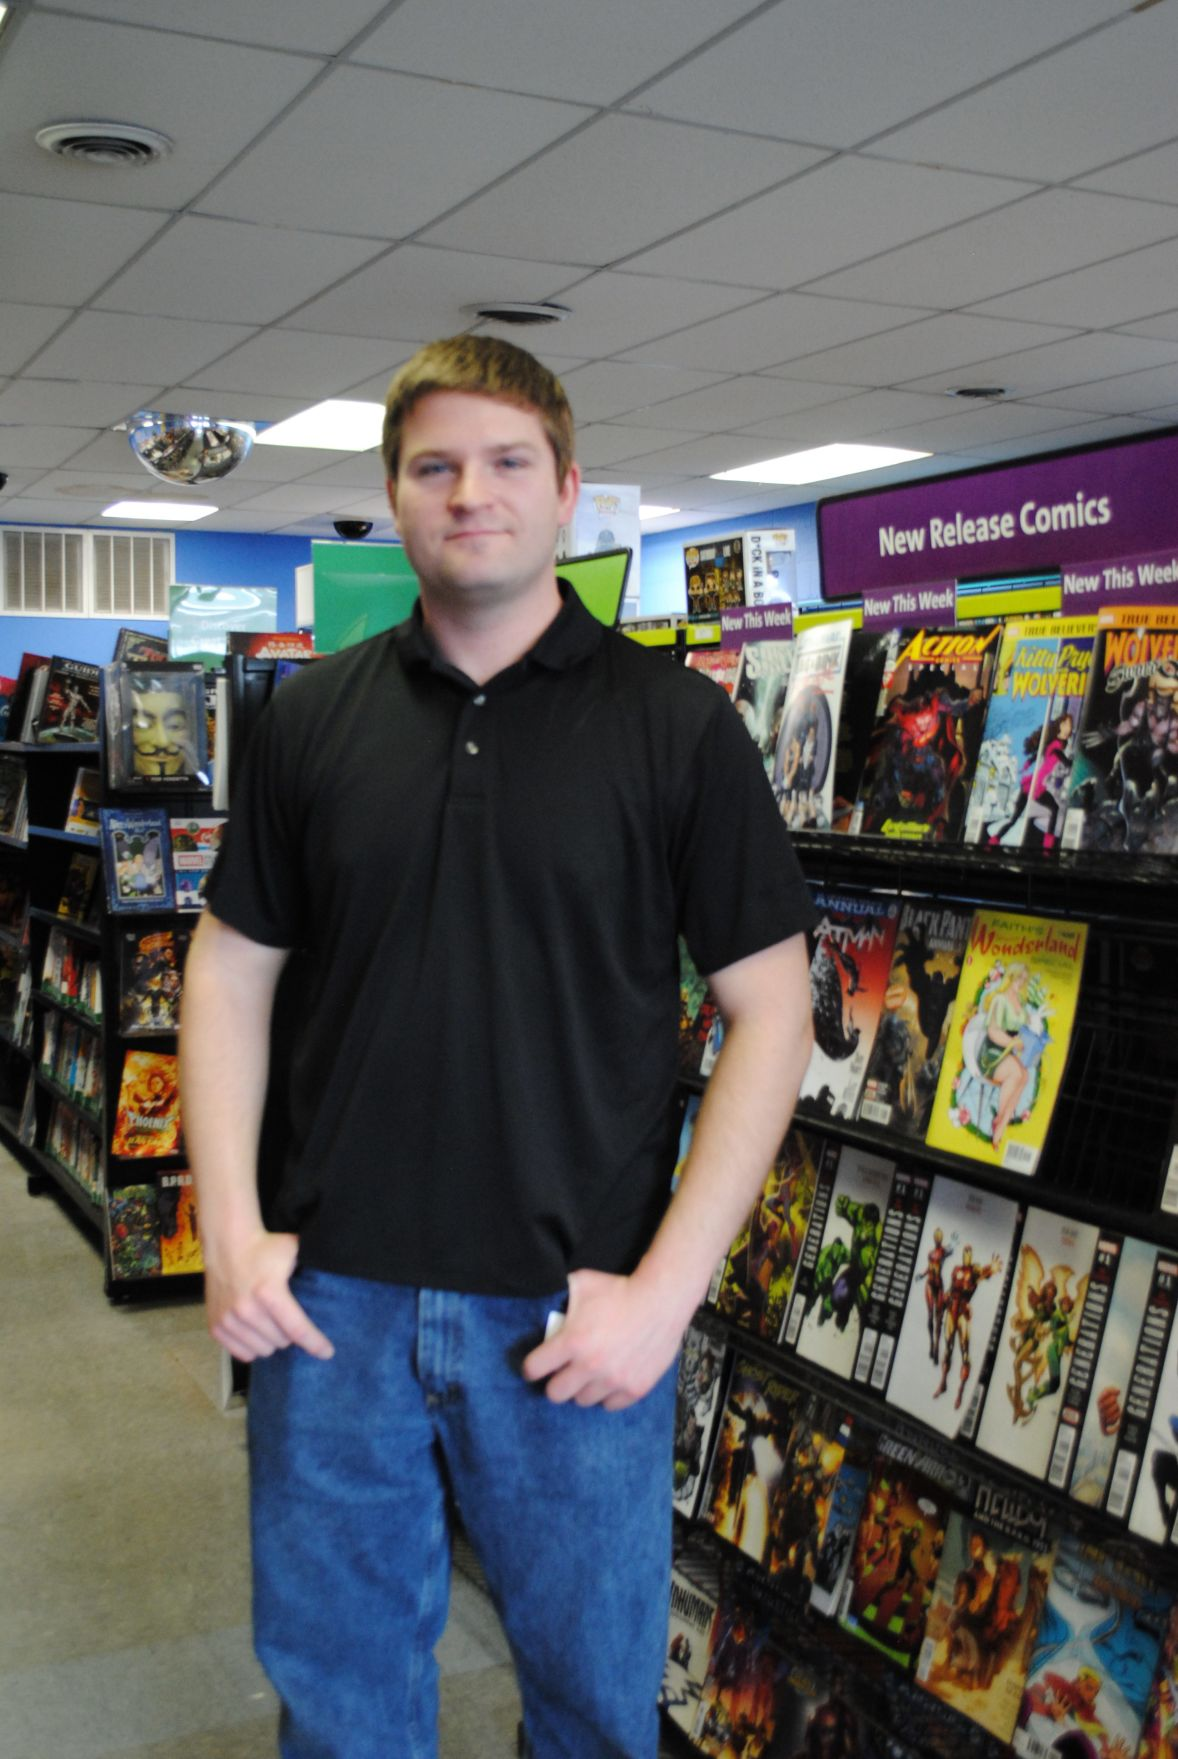 Local store participates in Free Comic Book Day